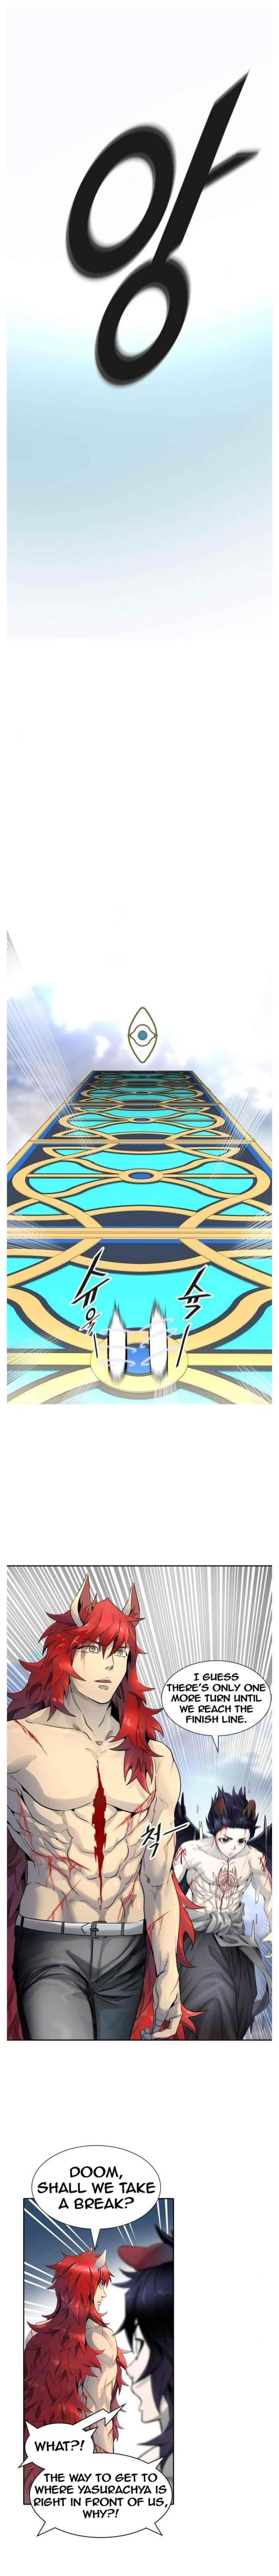 Tower Of God Chapter 506 page 9 - Mangakakalot